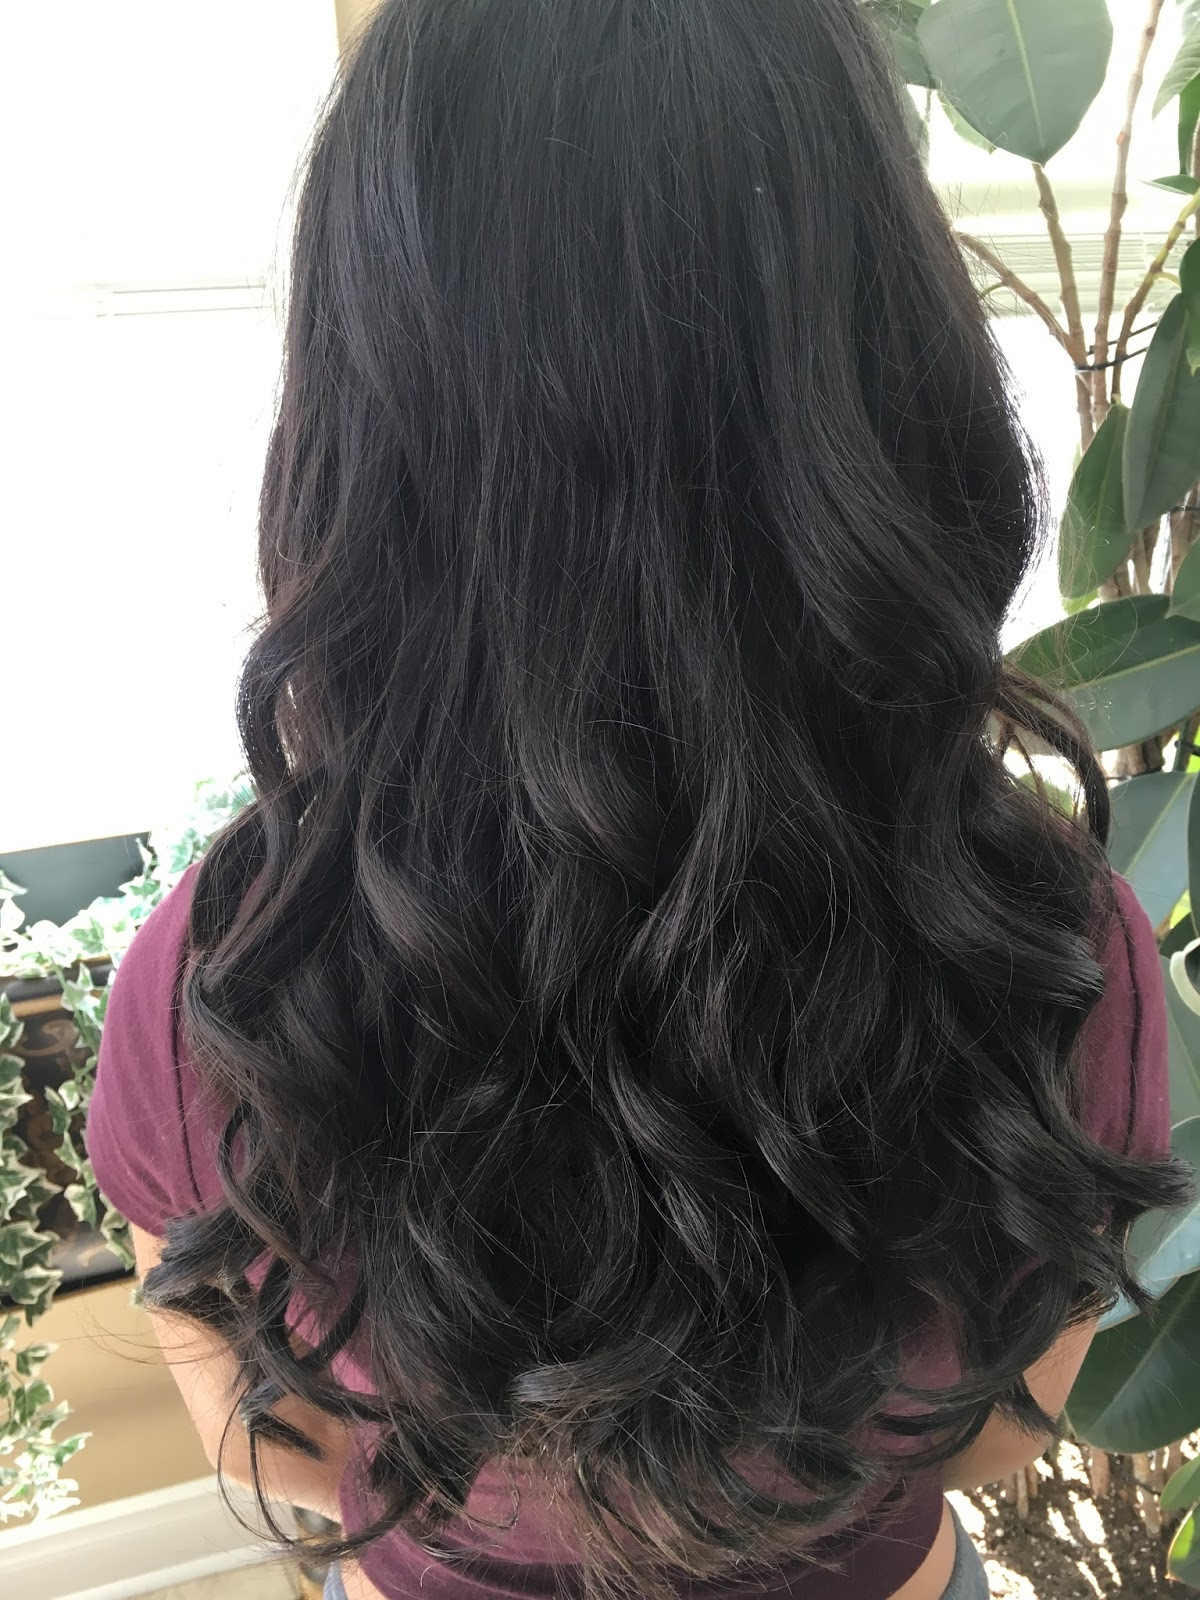 Divya Asnani 5 Easy Hacks For Long Lasting Curls